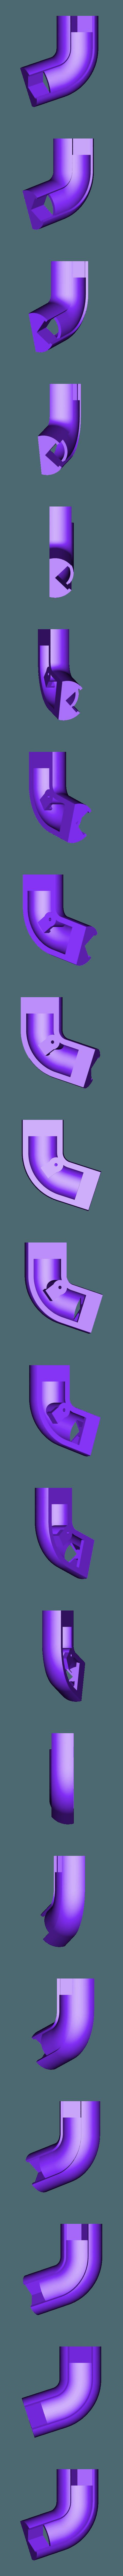 profil LED alum v2.stl Download STL file LED ceiling light • Model to 3D print, tomcasa